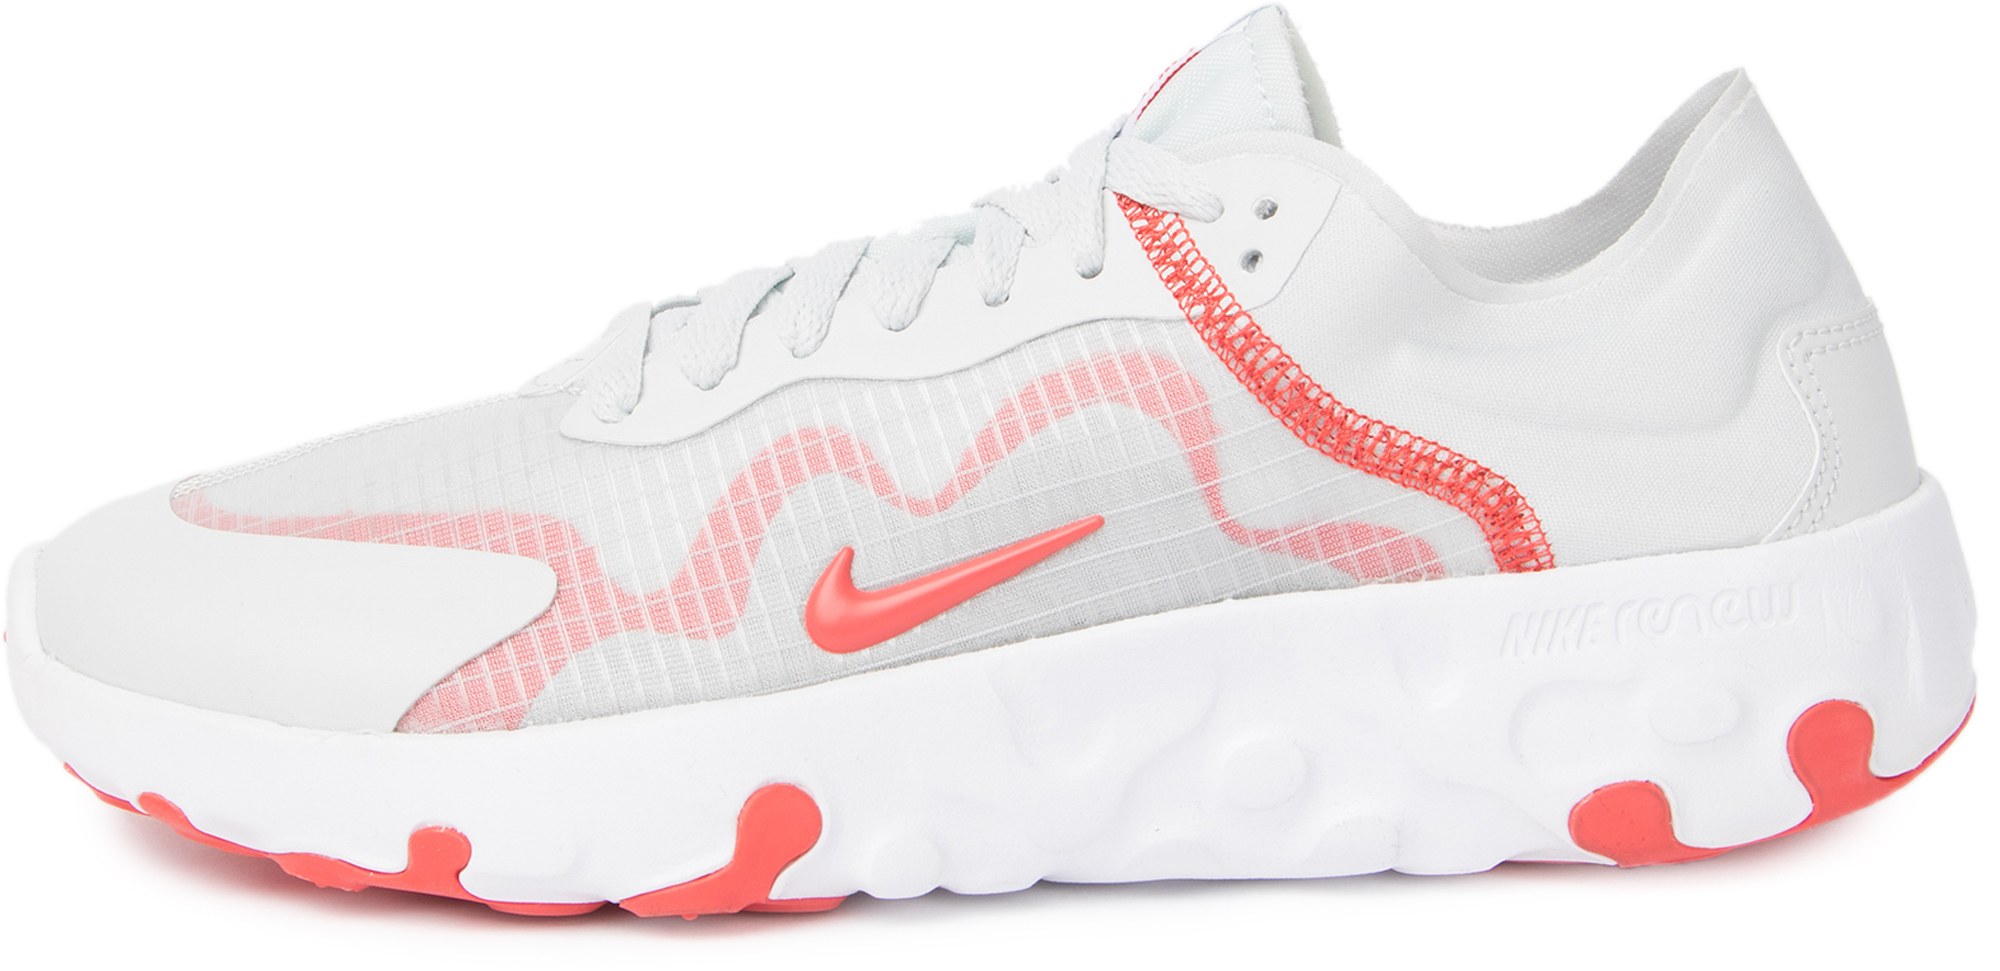 Nike Кроссовки женские Nike Renew Lucent, размер 36,5